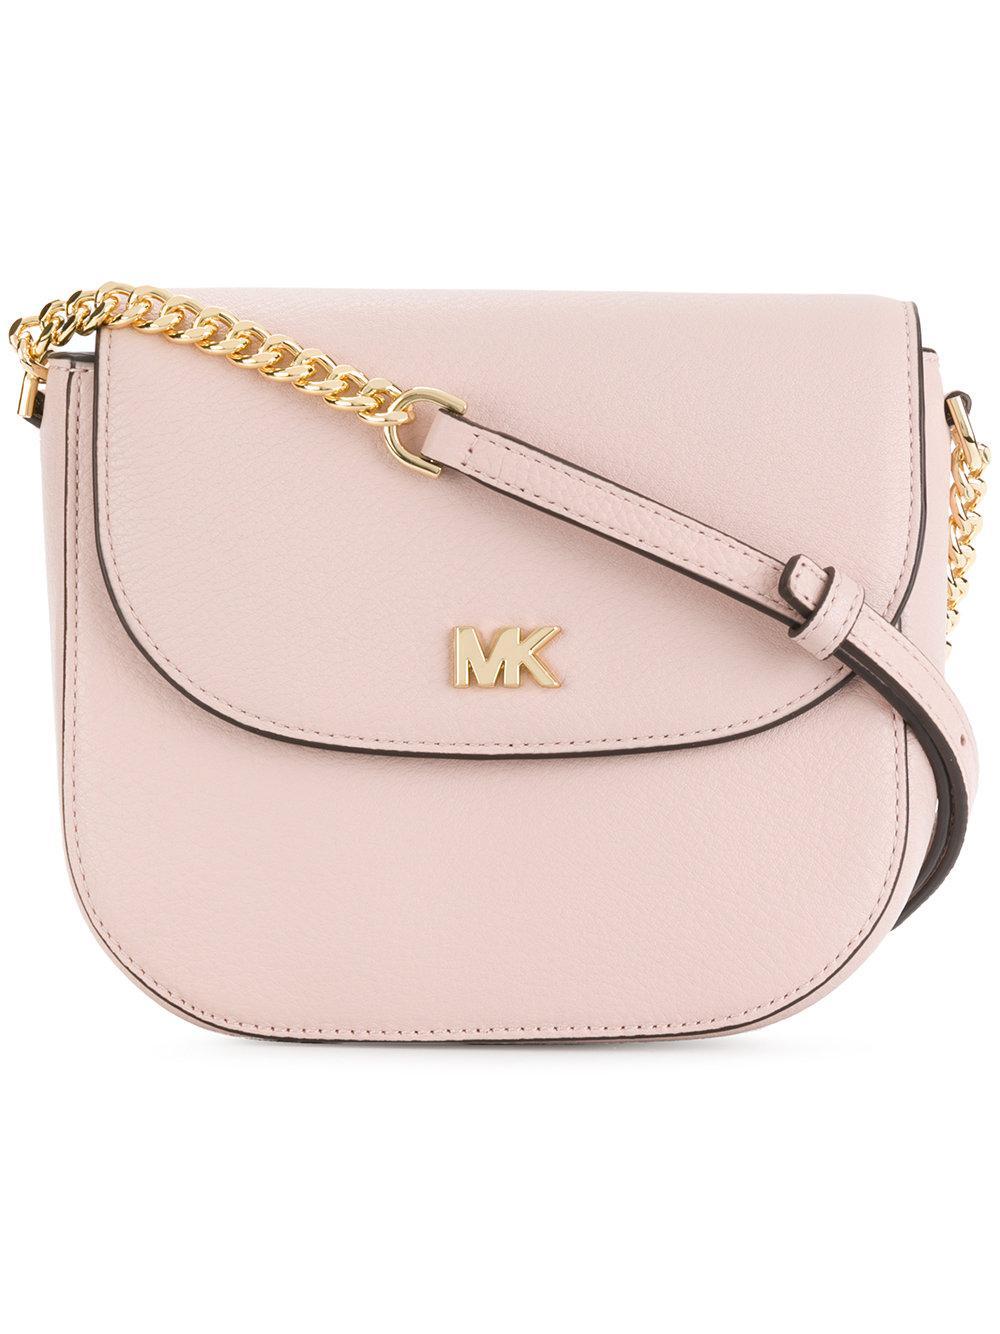 681a404370ec Michael Michael Kors Cross Body Bag - Farfetch In Pink | ModeSens